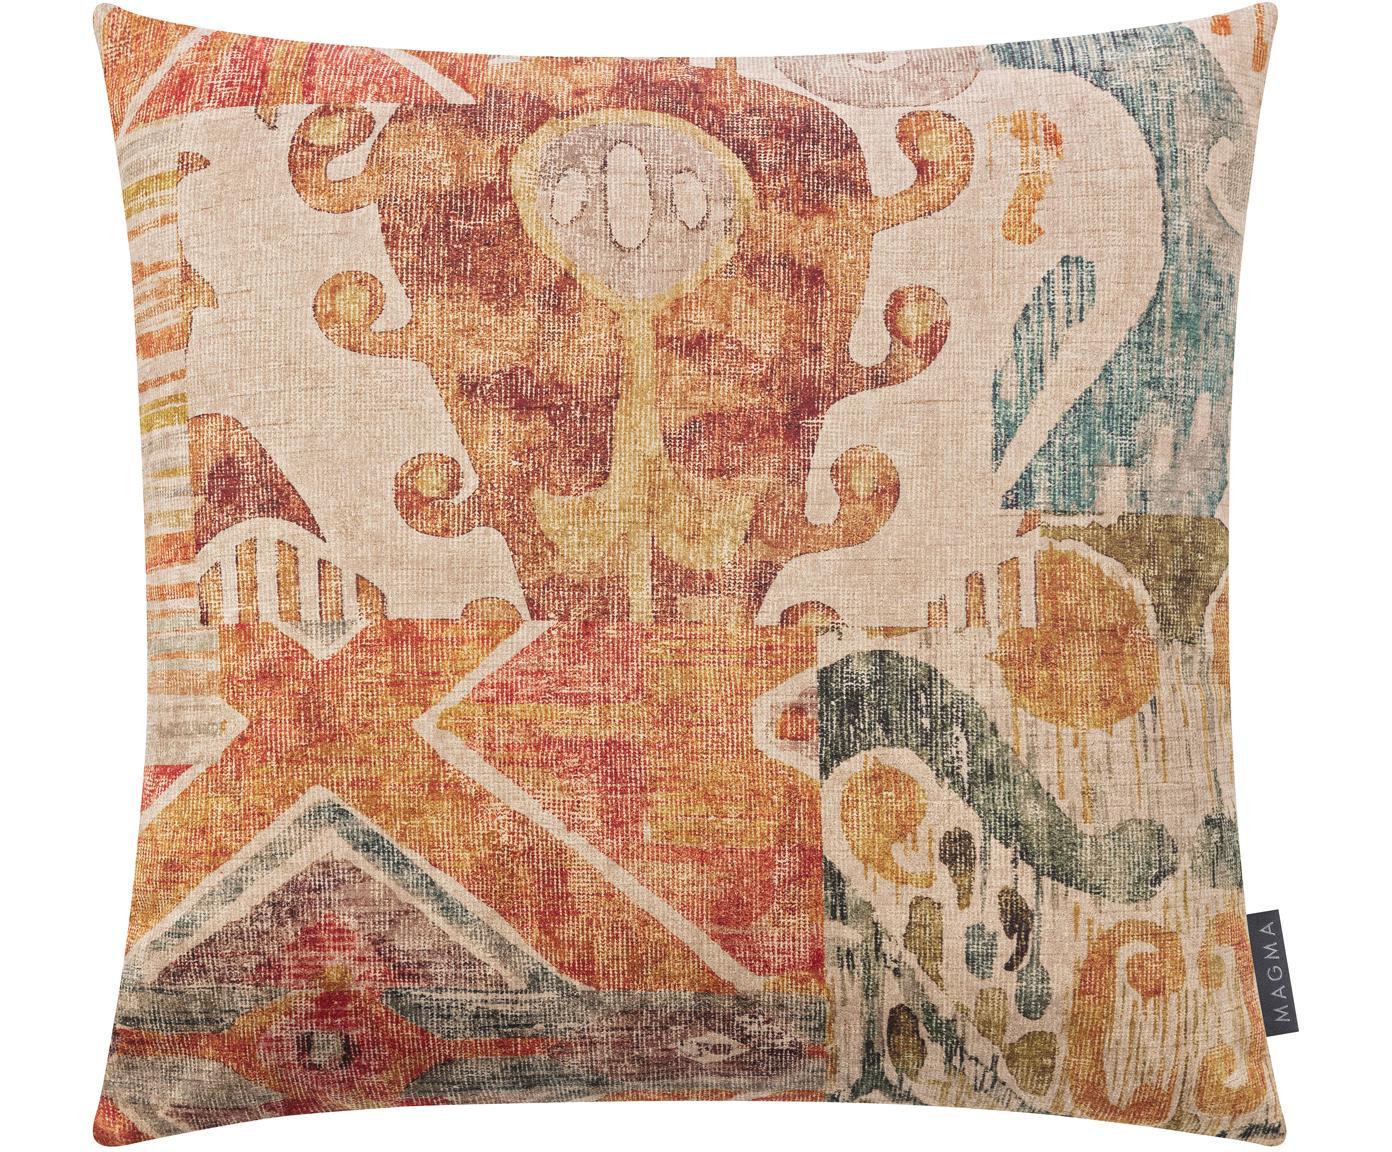 Funda de cojín de terciopelo Cosima, estilo étnico, 100%terciopelo de poliéster, Naranja, multicolor, An 40 x L 40 cm